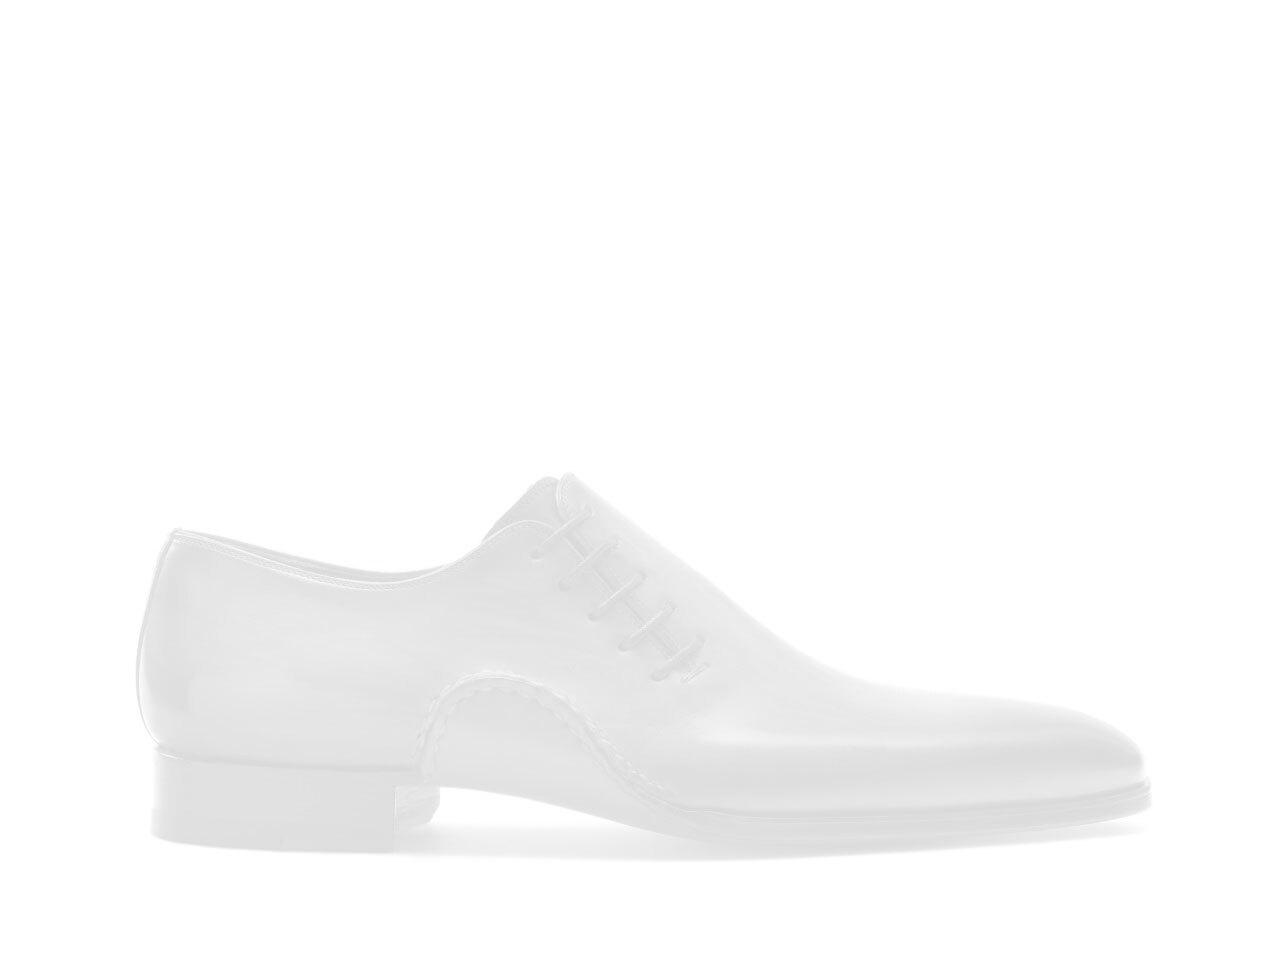 Navy blue suede single monk strap shoes for men - Magnanni